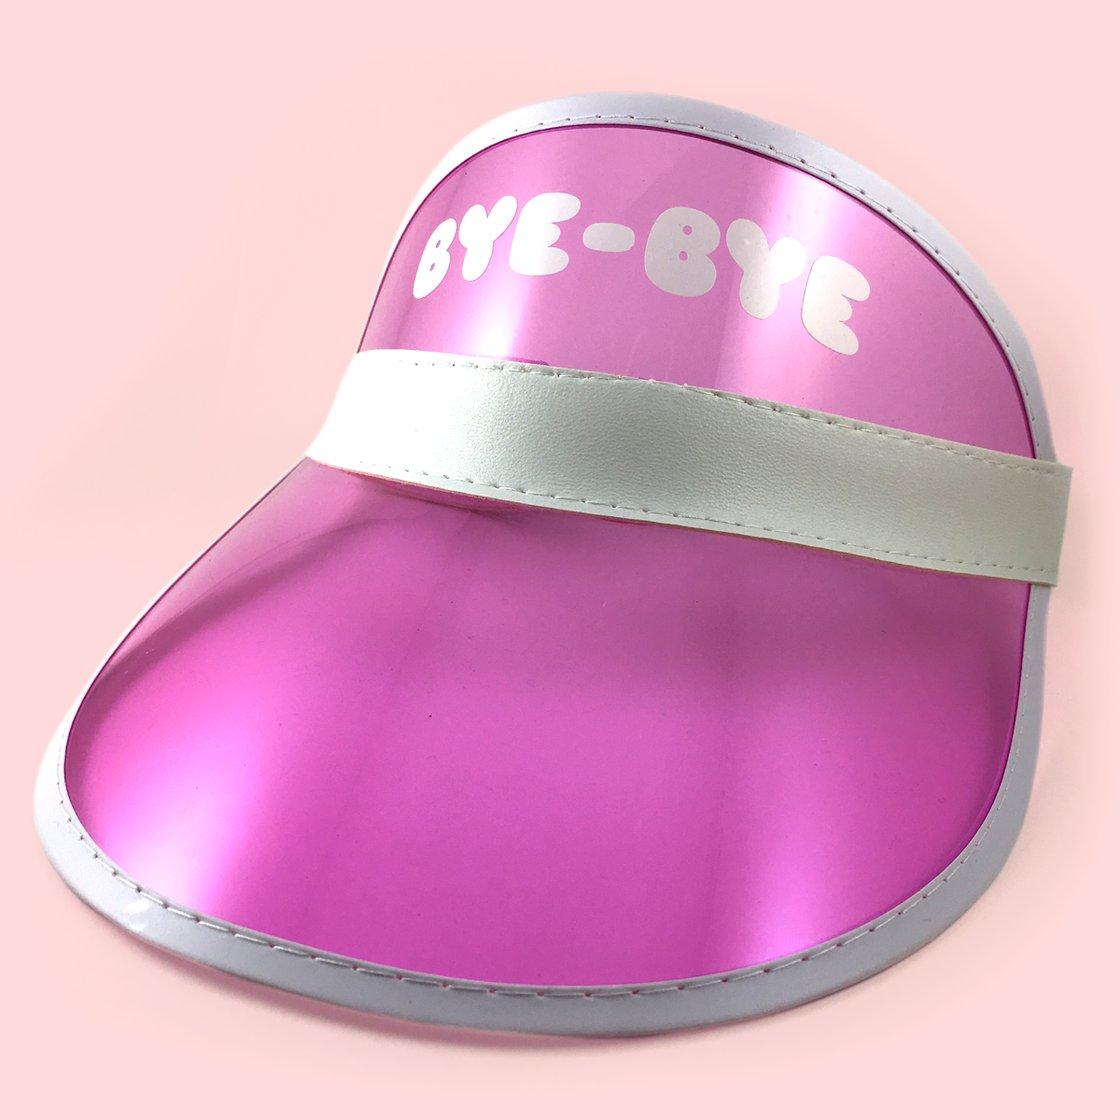 Image of PERSONAL SPACE II: pink visor